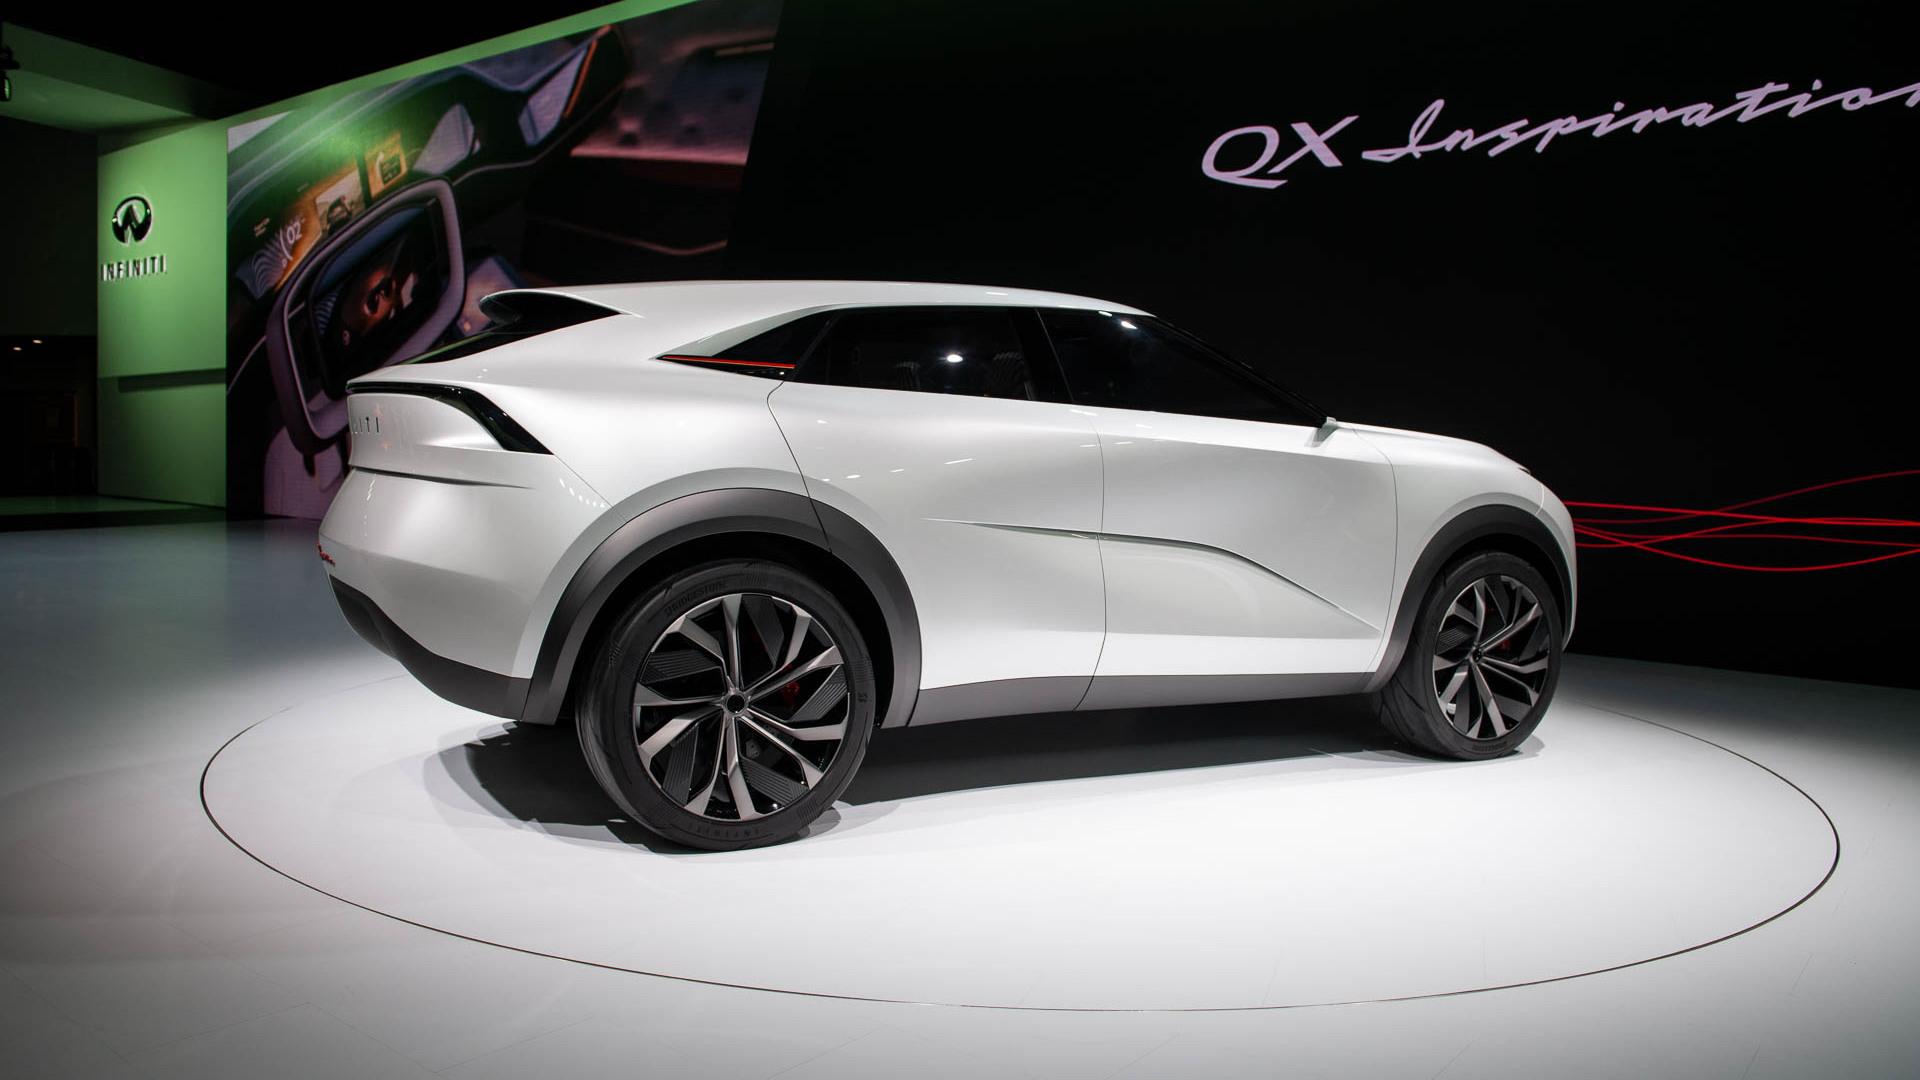 Infiniti Qx Inspiration Suv Concept 2019 Detroit Auto Show